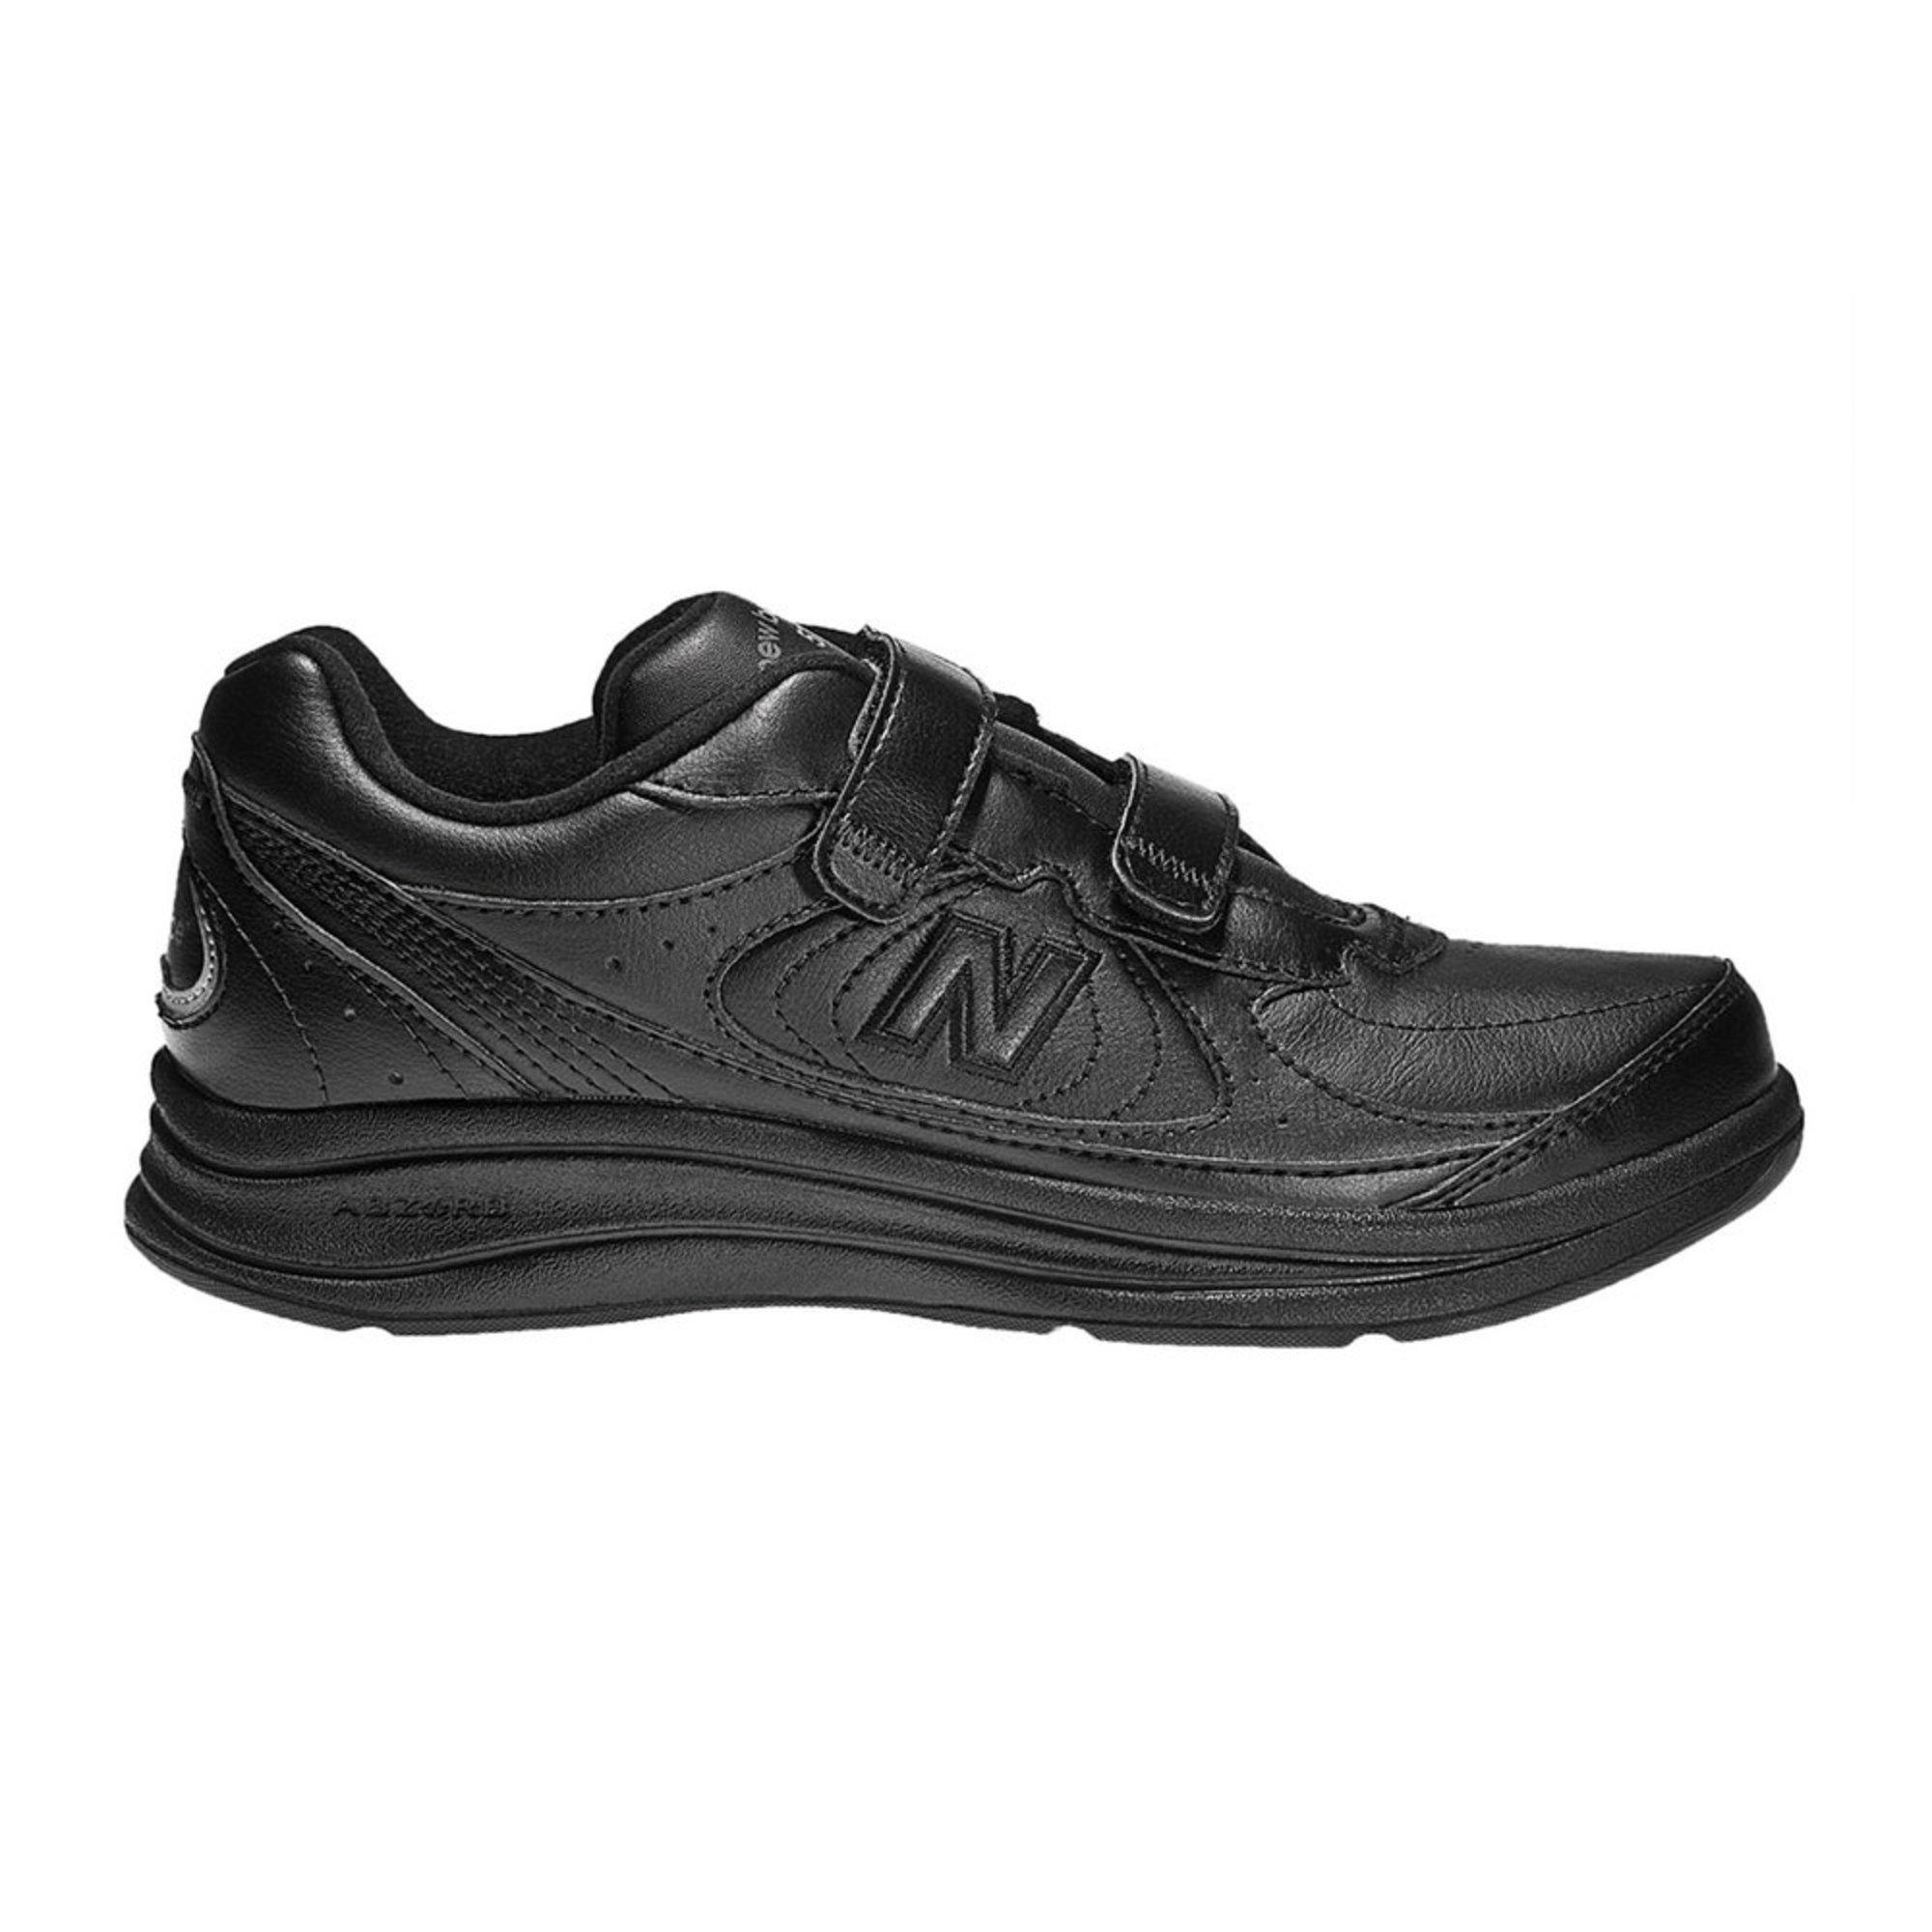 New Balance Men's 577 Walking Shoe